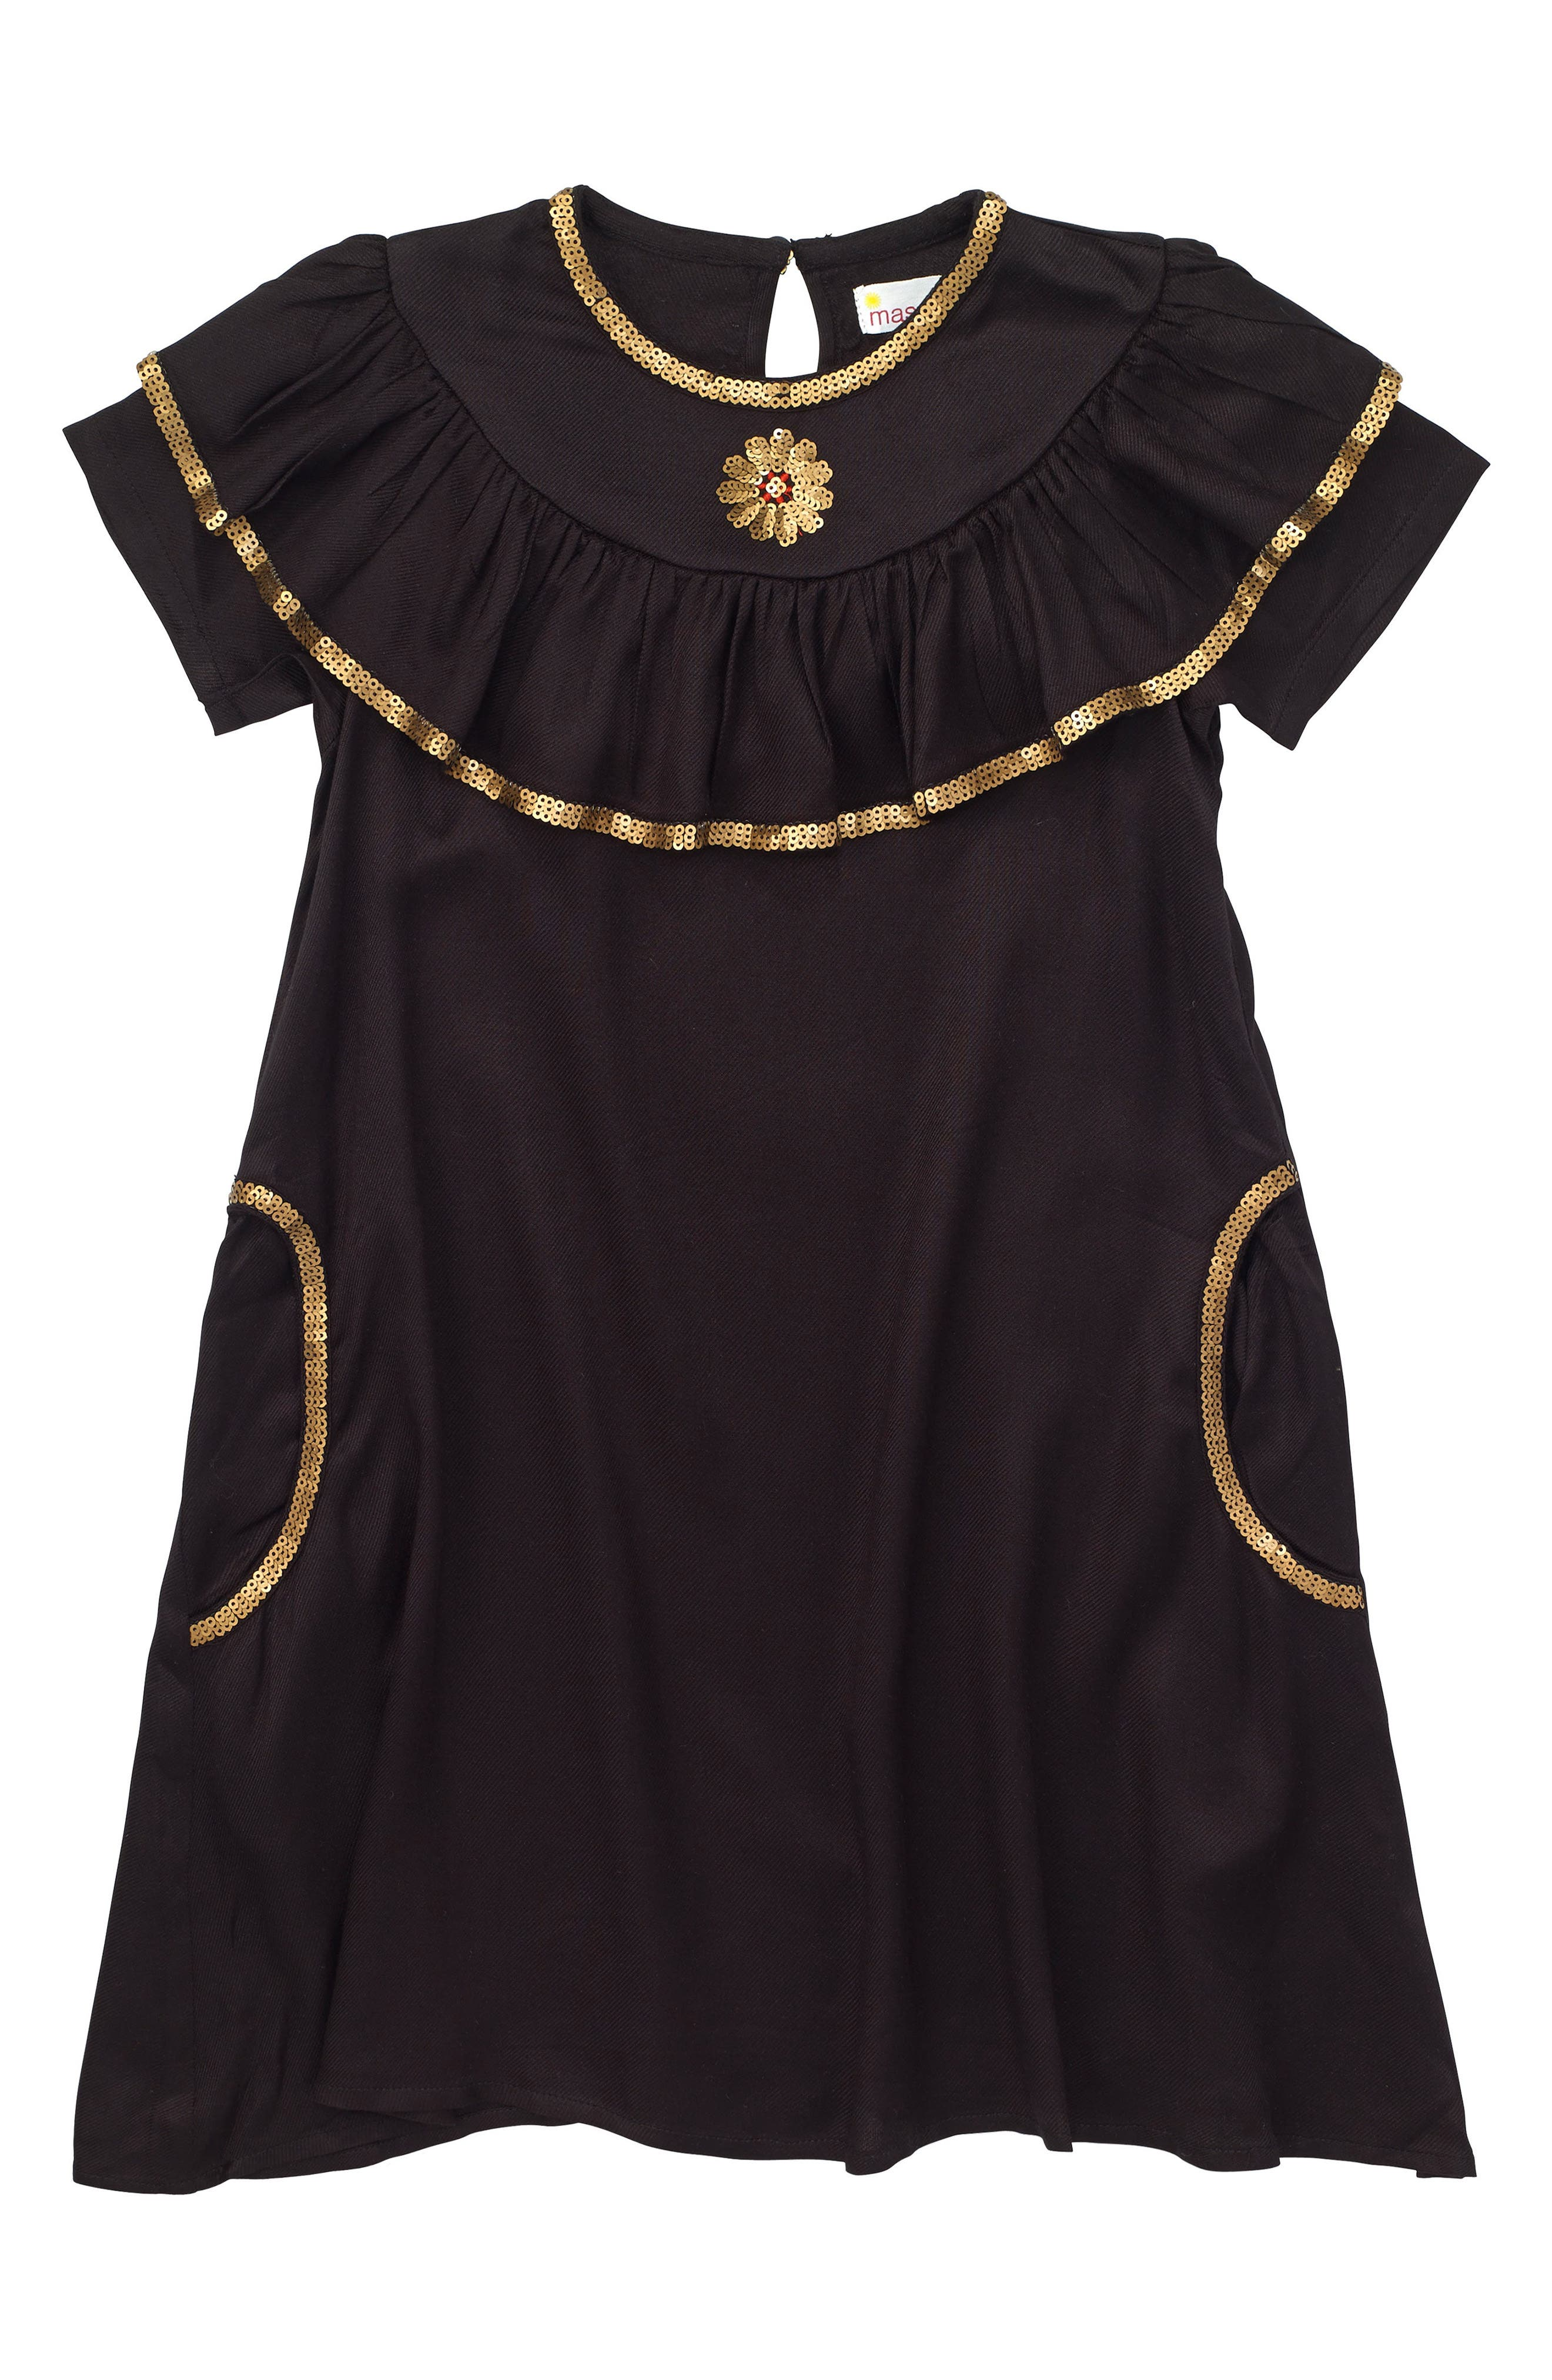 Enchanted Dress,                             Main thumbnail 1, color,                             Black